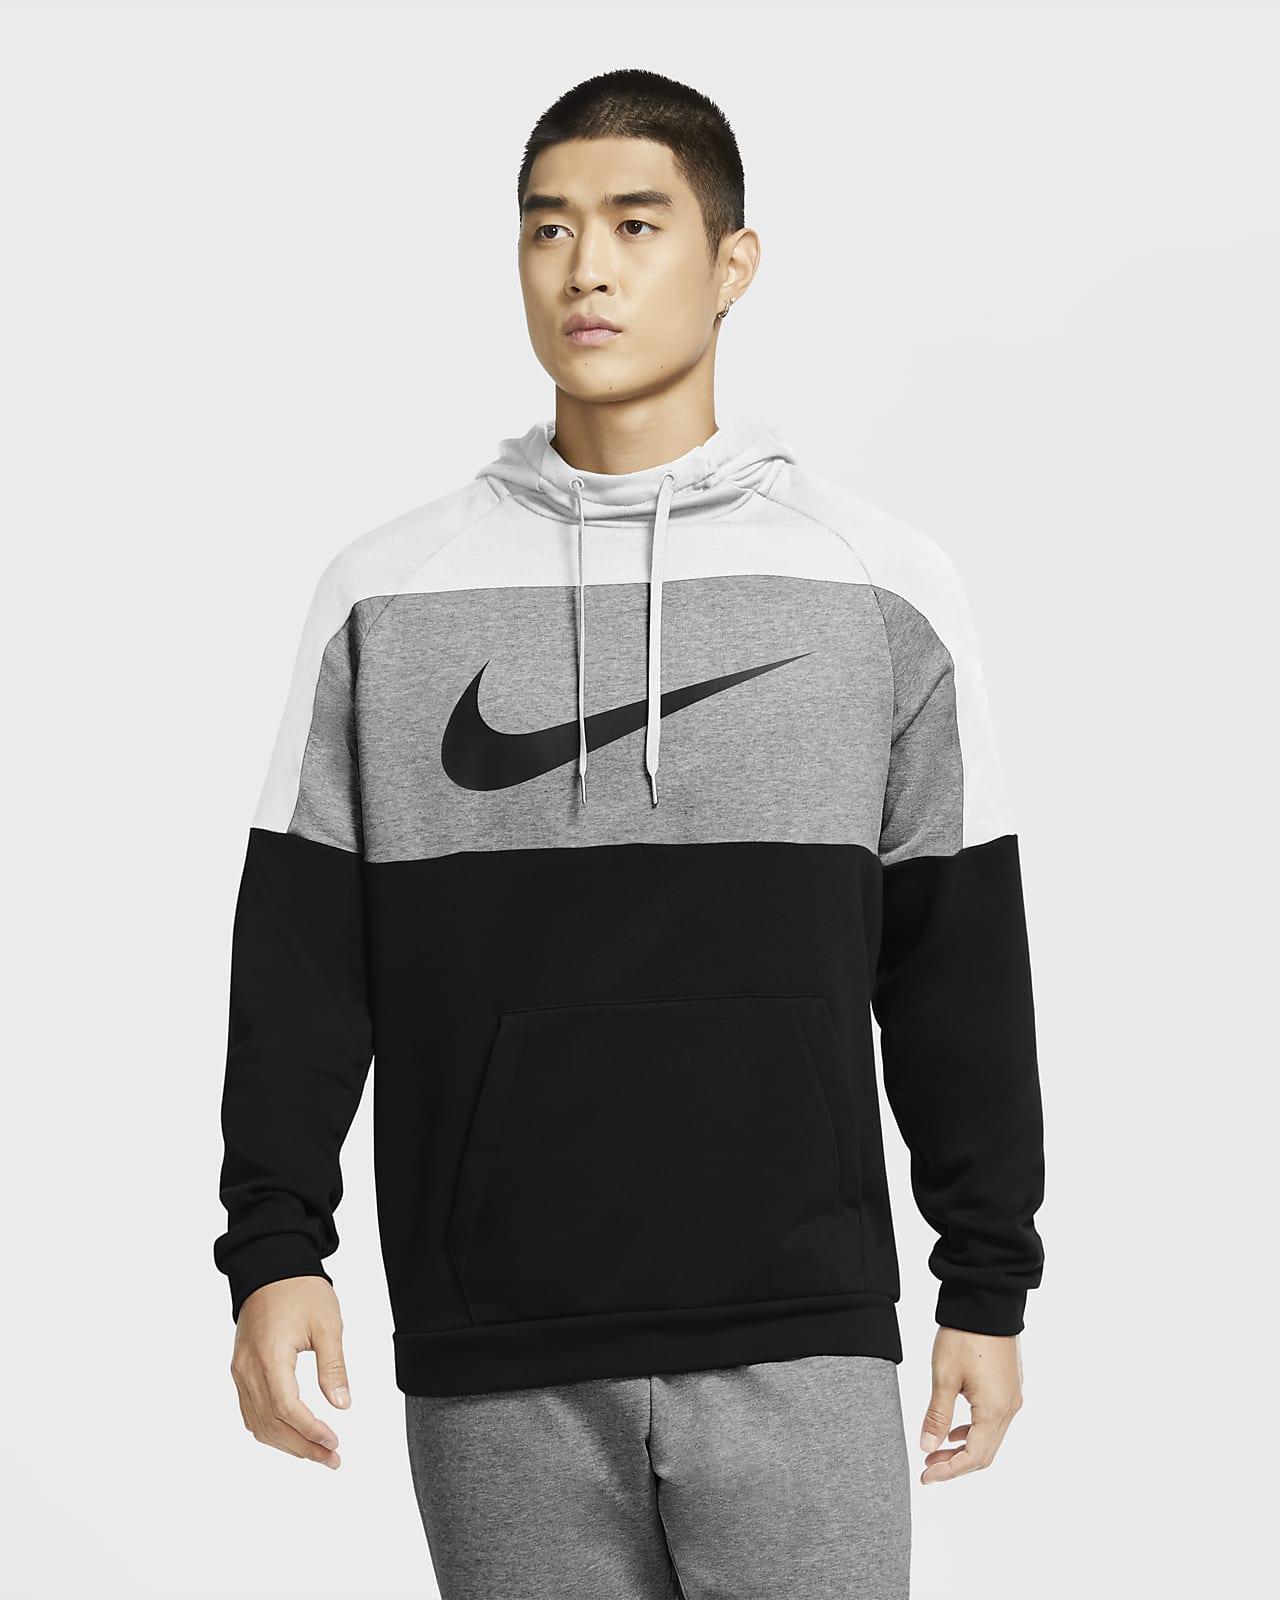 Hoodie pullover de treino Nike Dri-FIT para homem